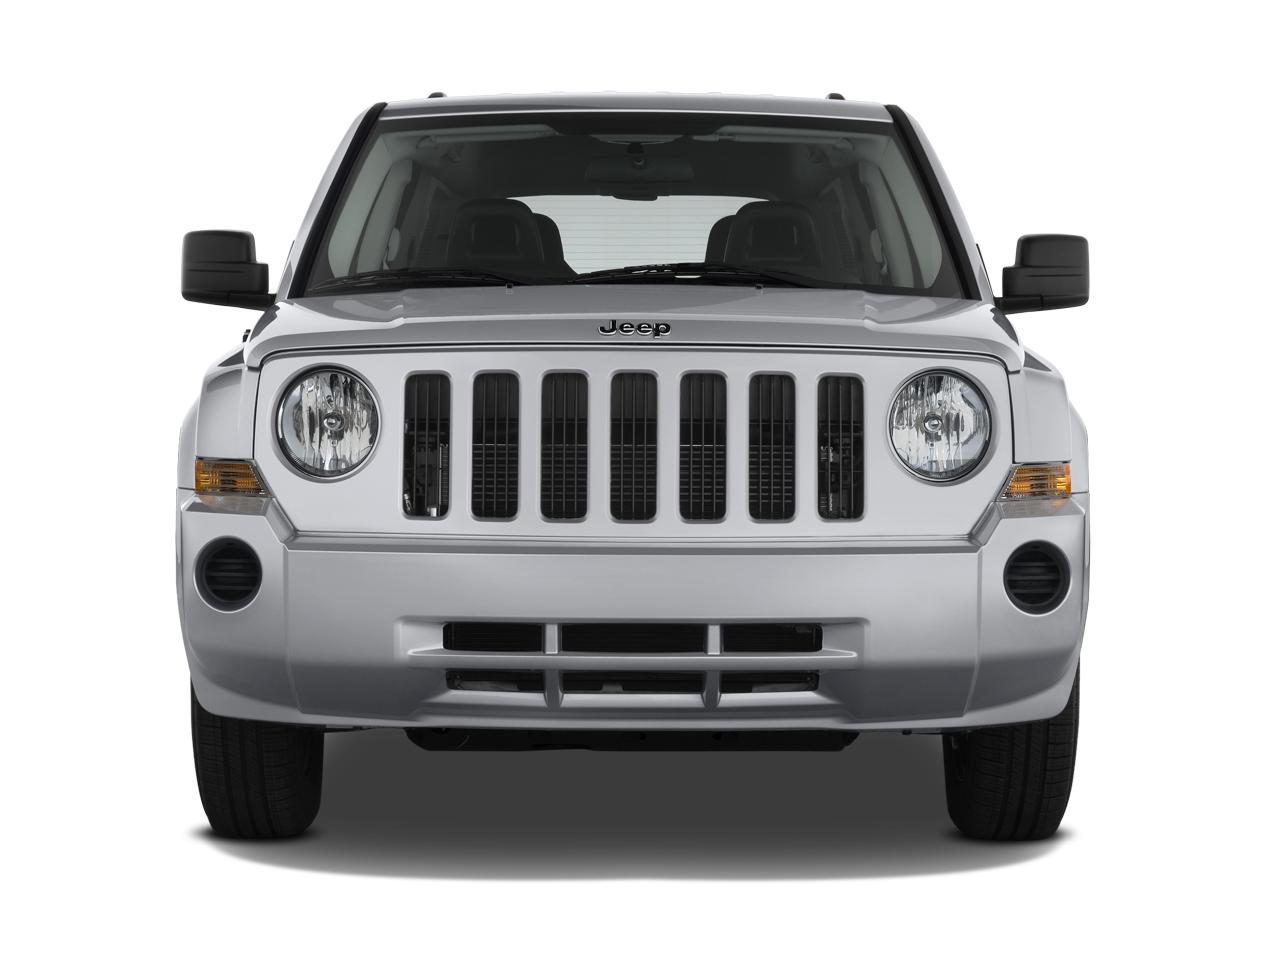 review 2010 jeep patriot. Black Bedroom Furniture Sets. Home Design Ideas